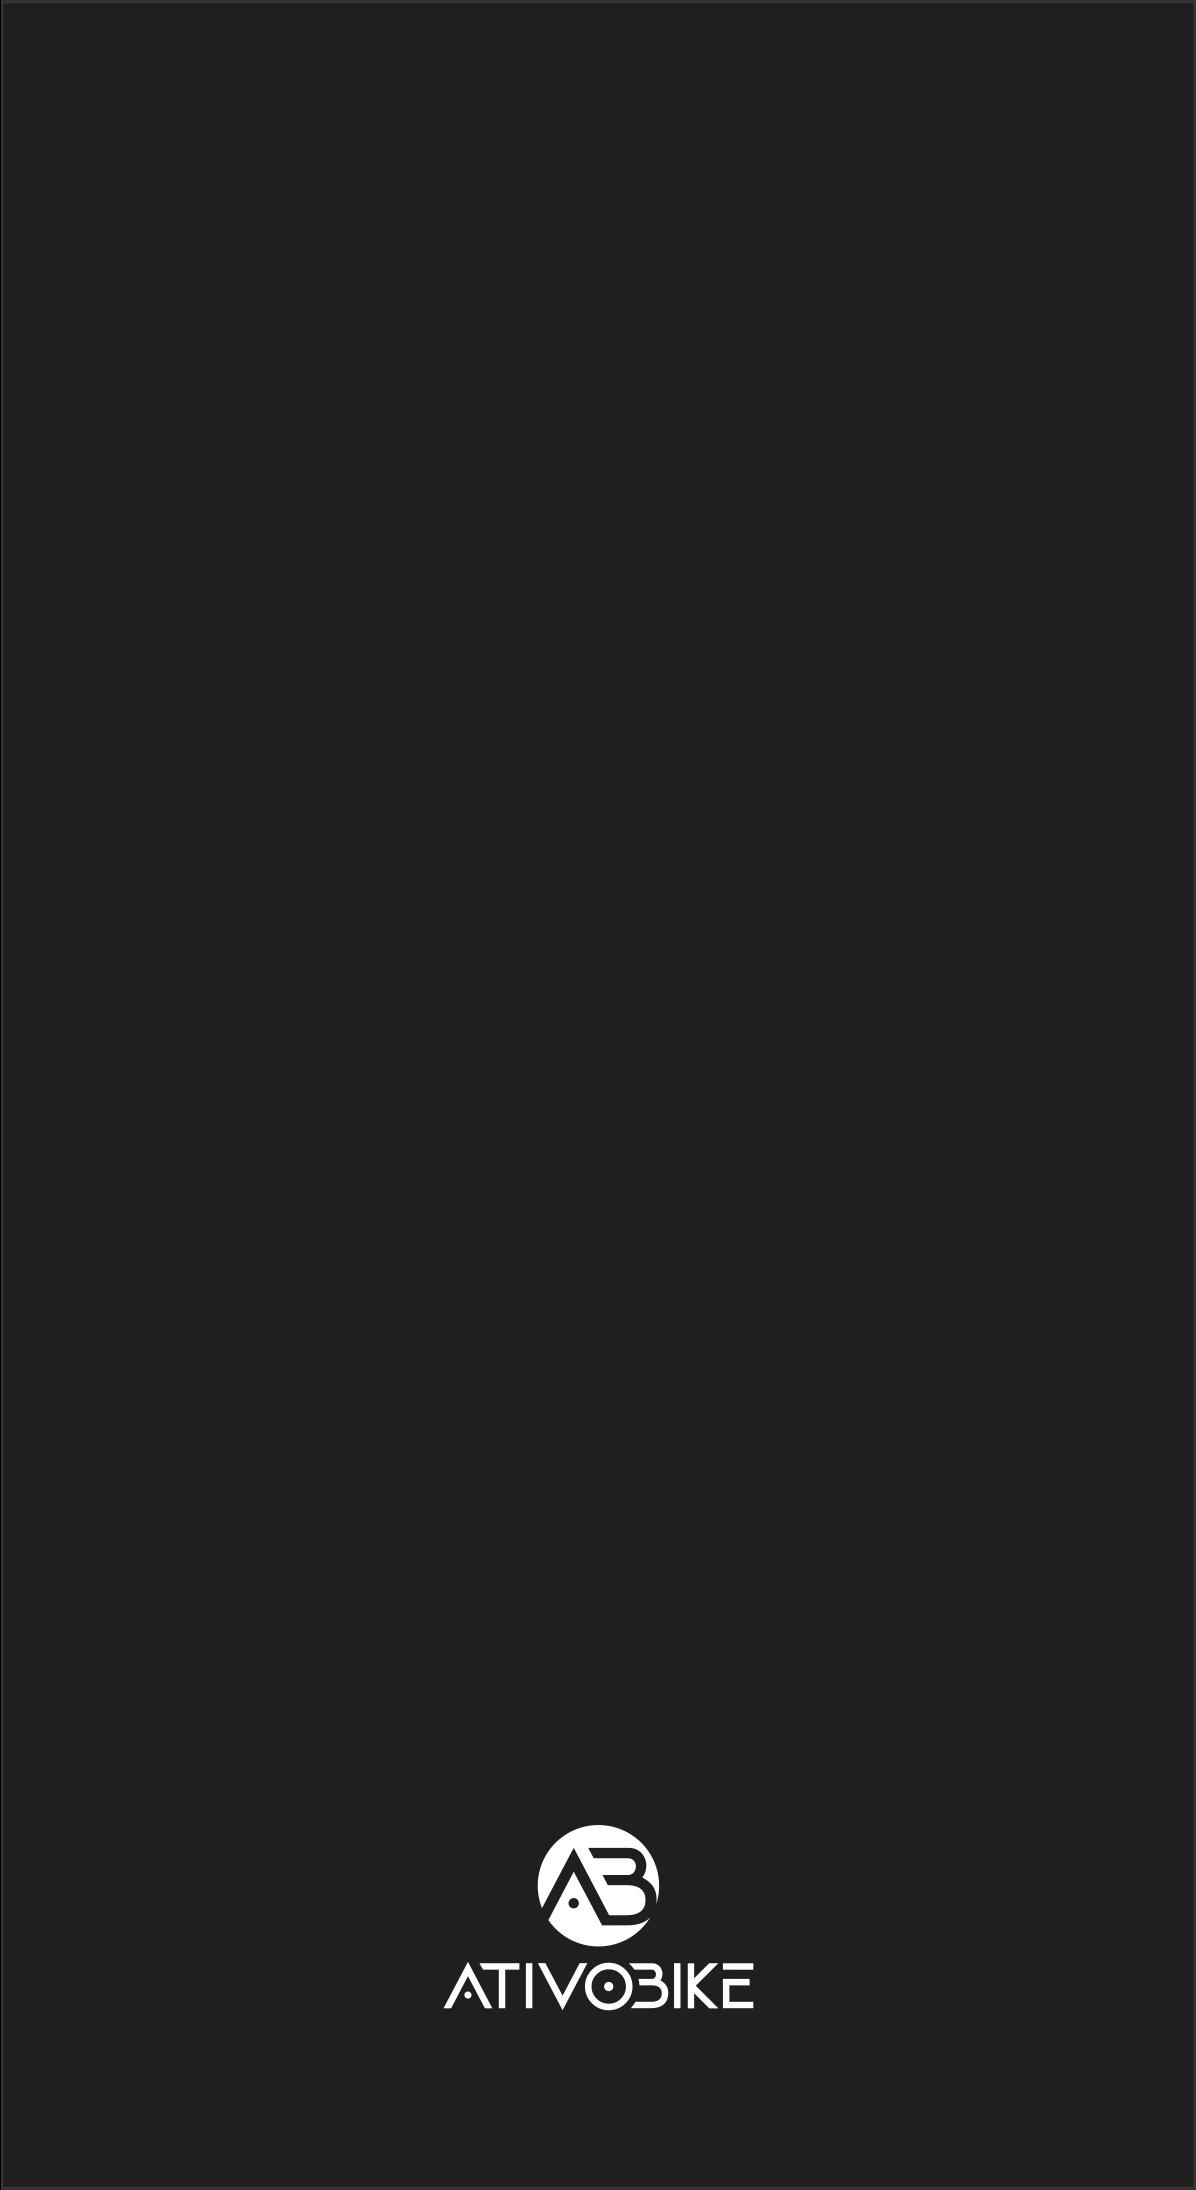 BANDANA TUBULAR CICLISMO ATIVOBIKE - PRETO (BLACK)